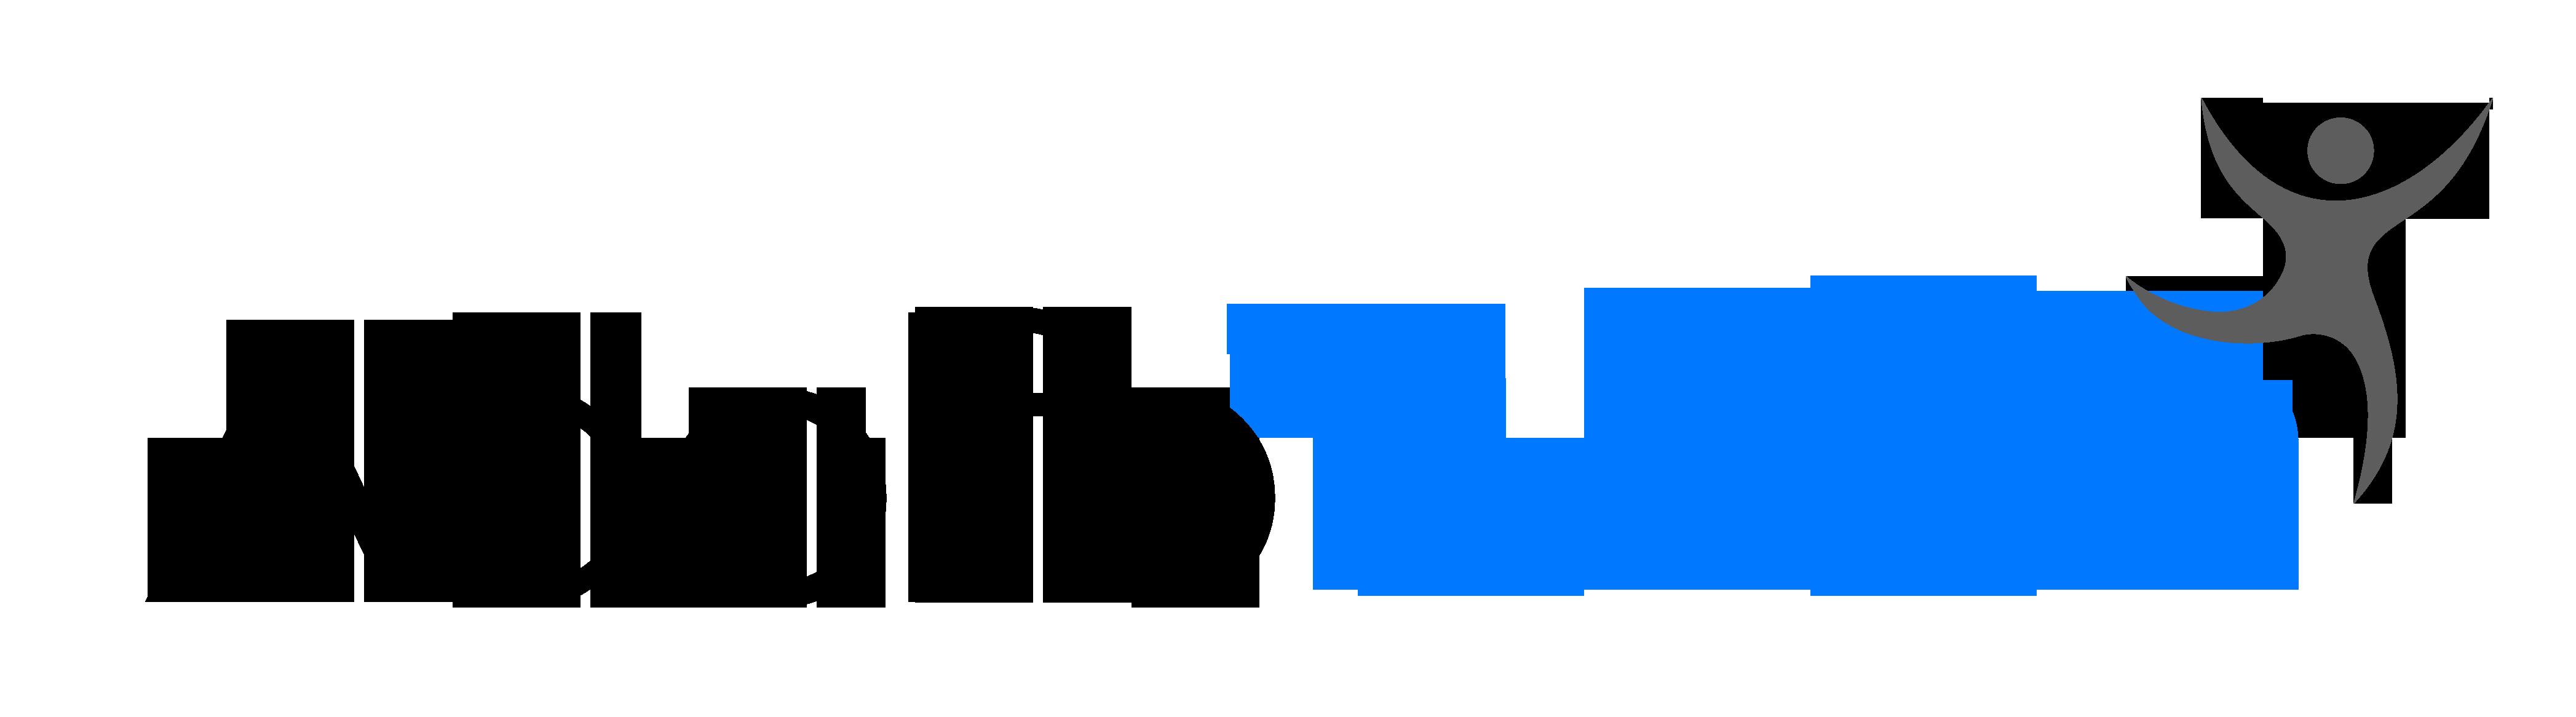 Adolfo Tuñon Blog